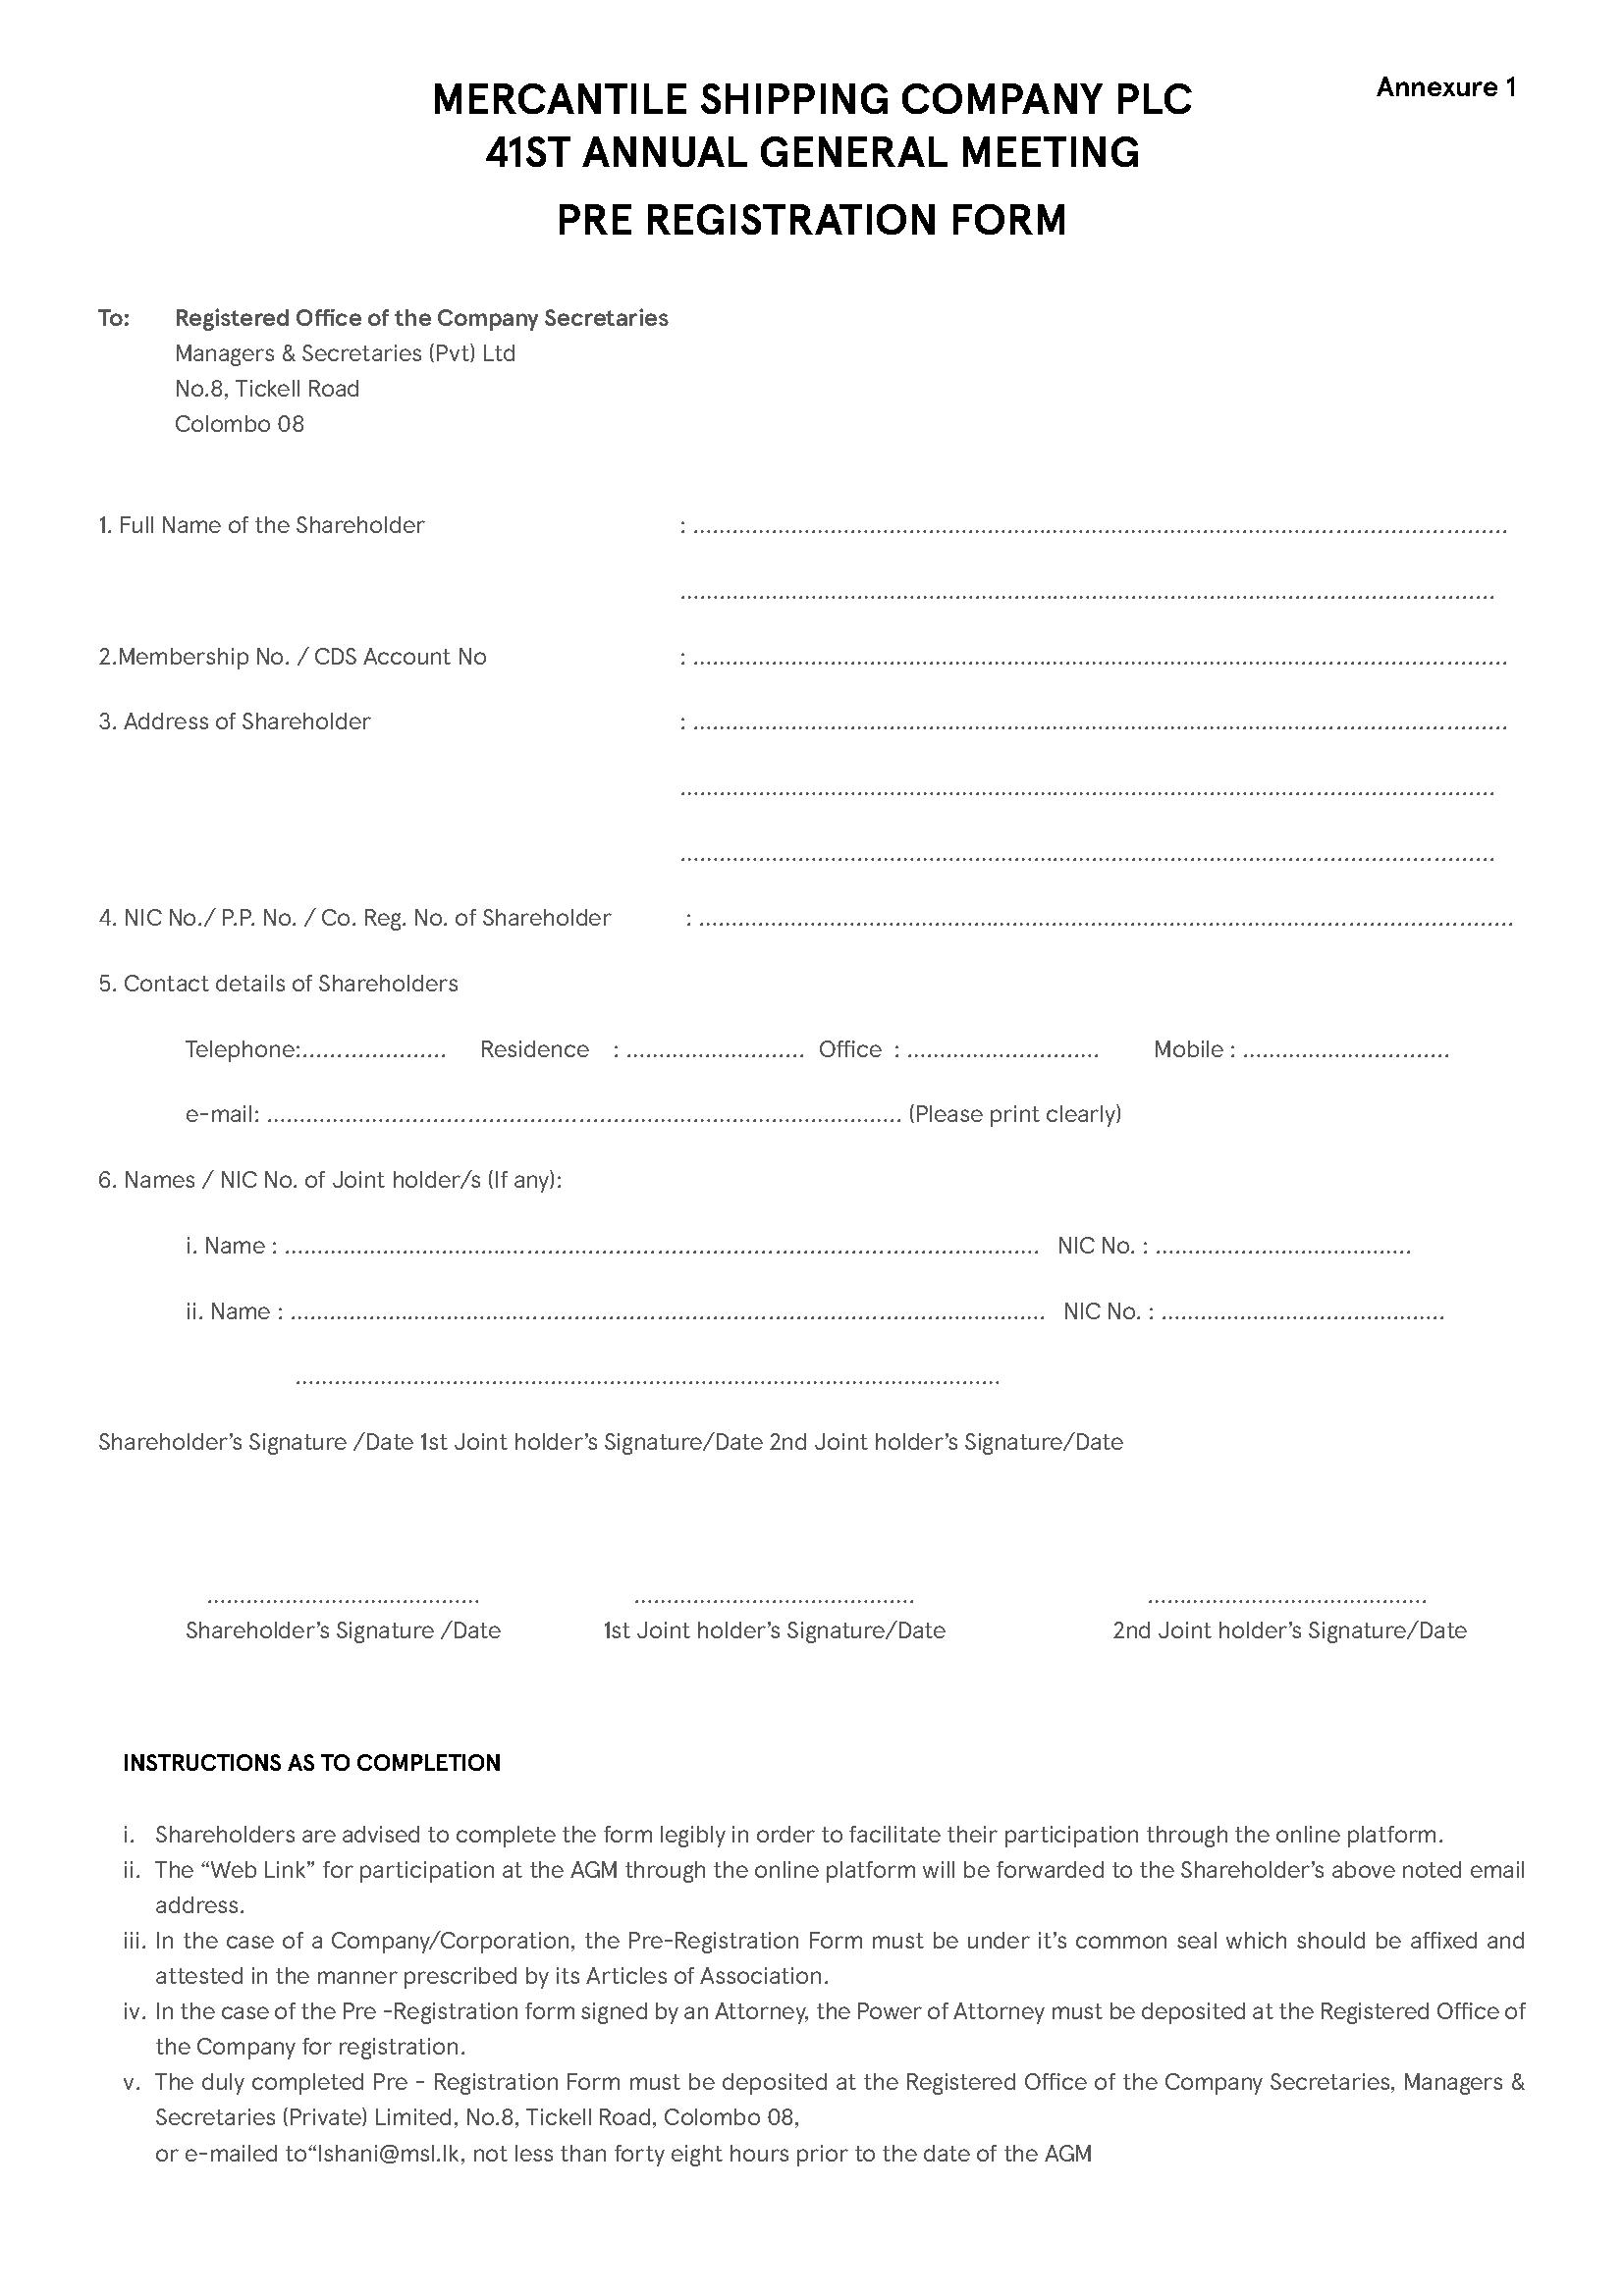 Annexure 1- Pre Registration Form